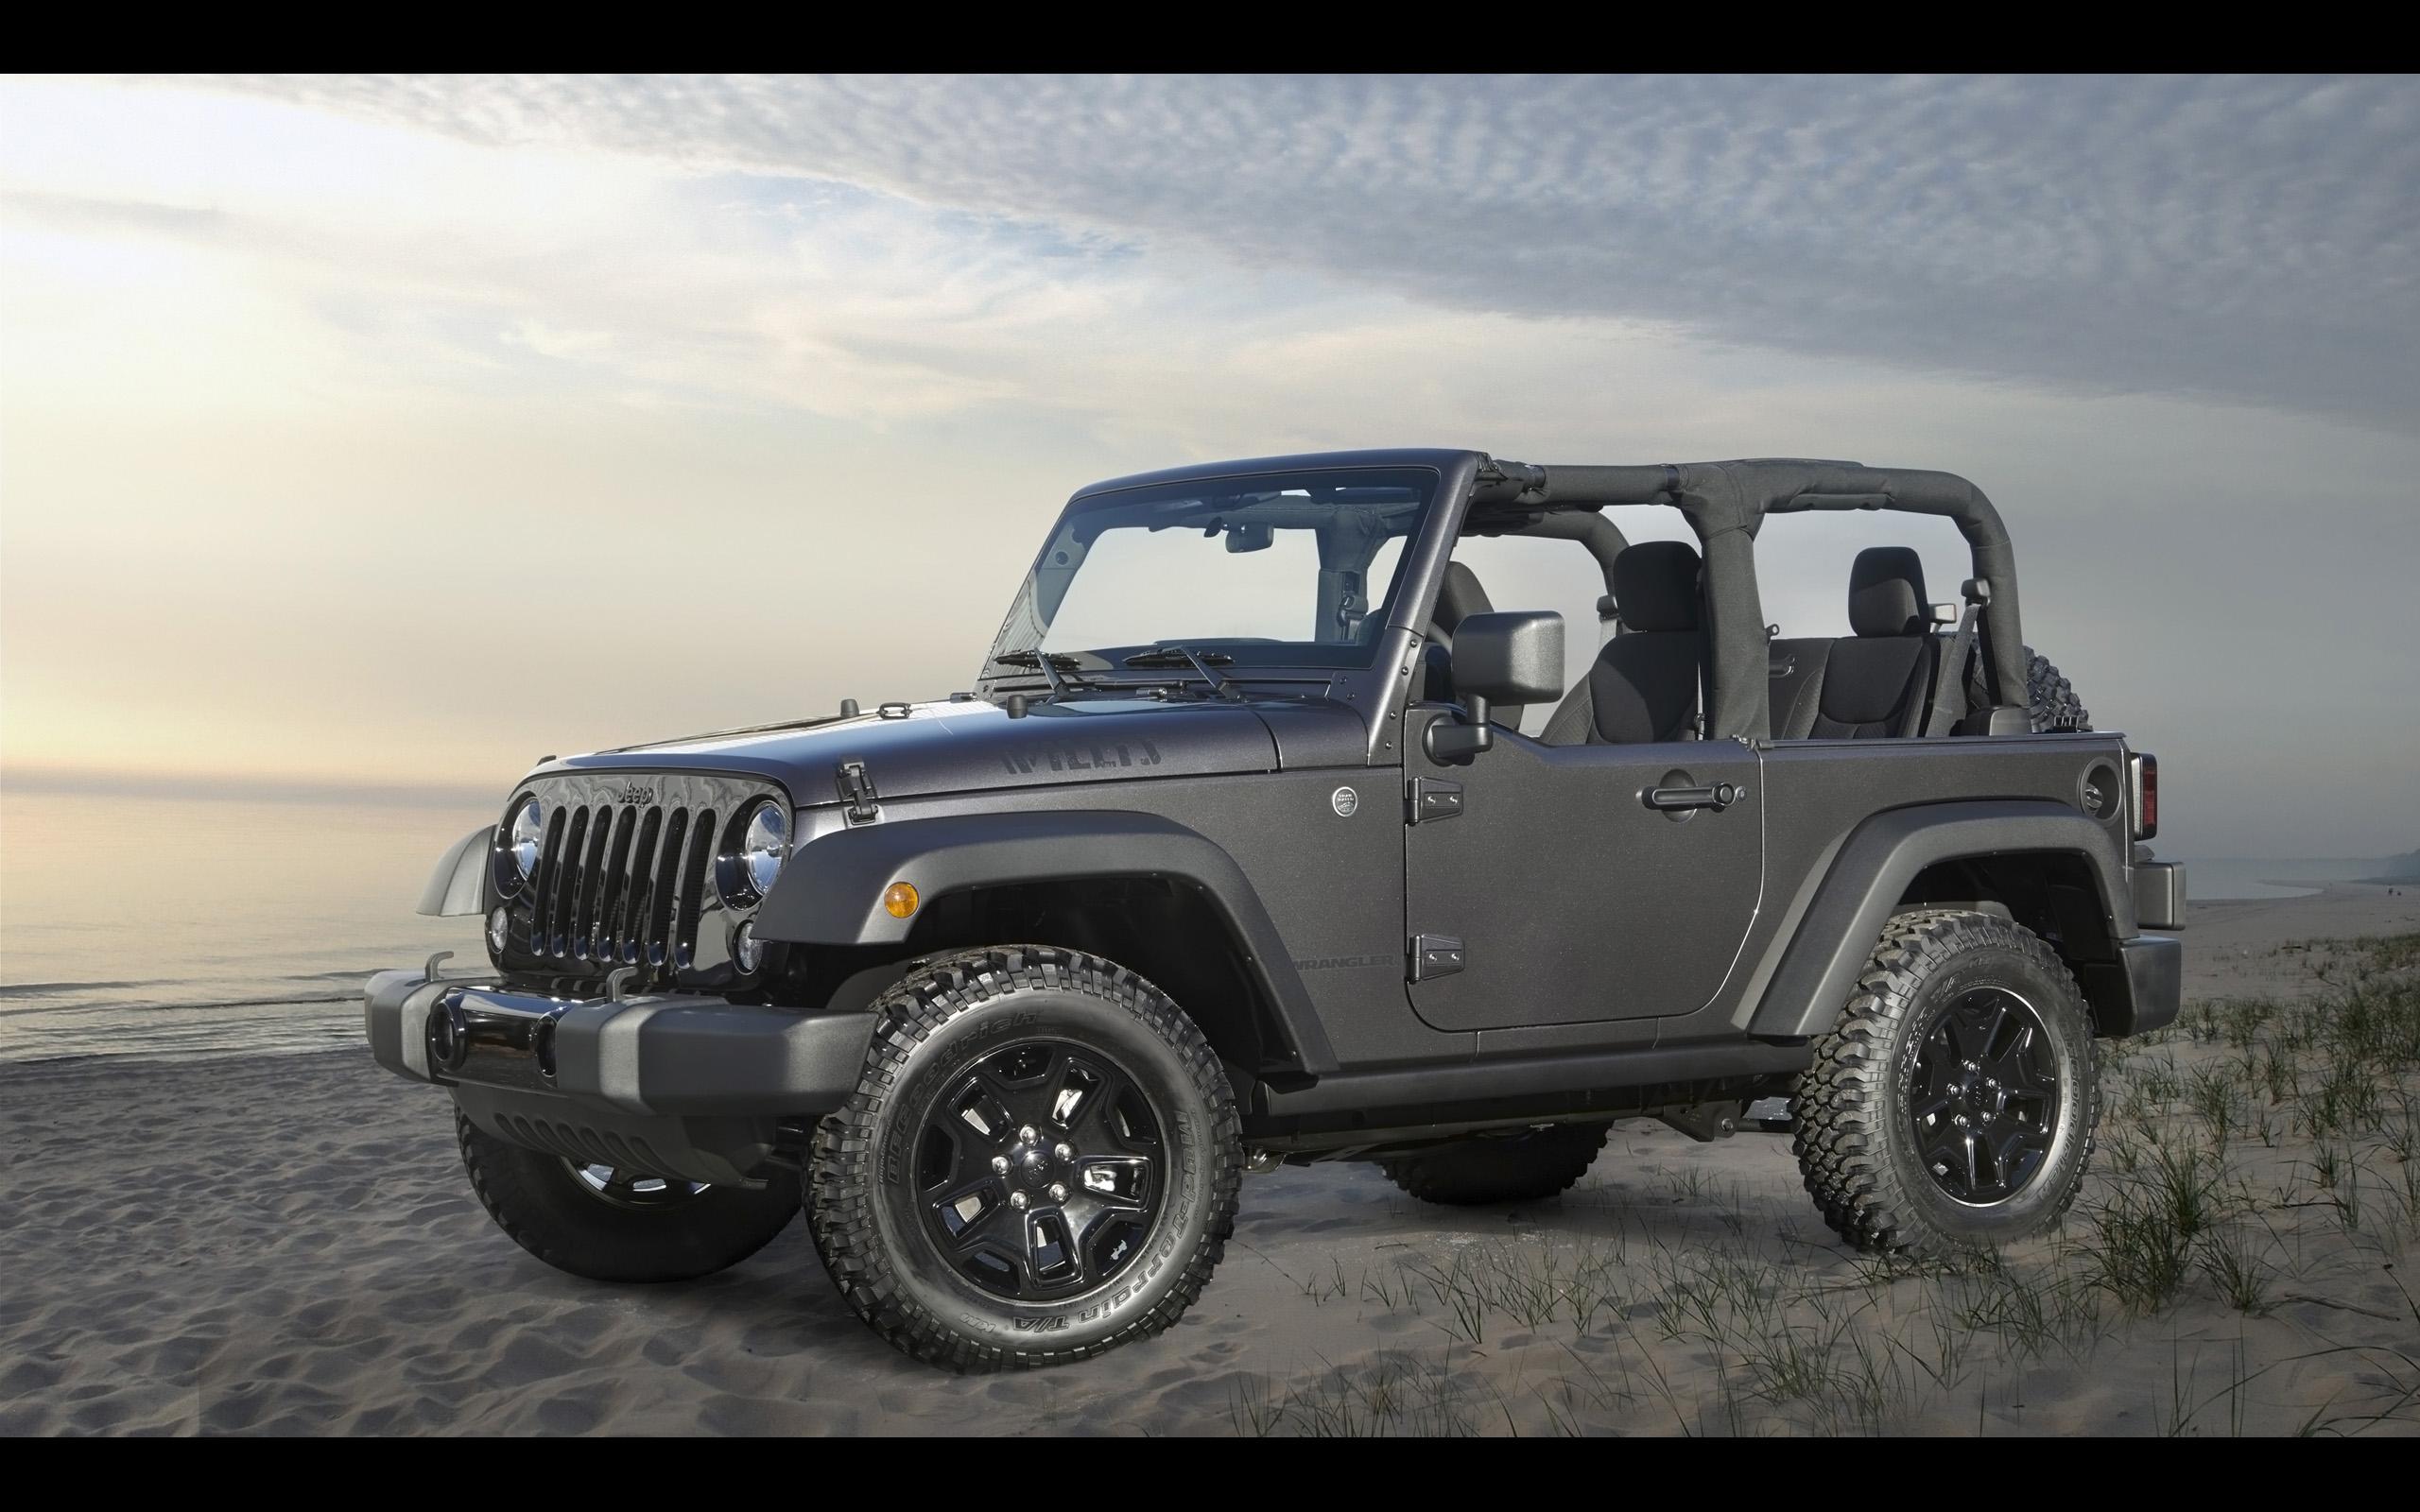 2014 jeep wrangler willys wheeler 4x4 f wallpaper 2560x1600 178261 wallpaperup. Black Bedroom Furniture Sets. Home Design Ideas